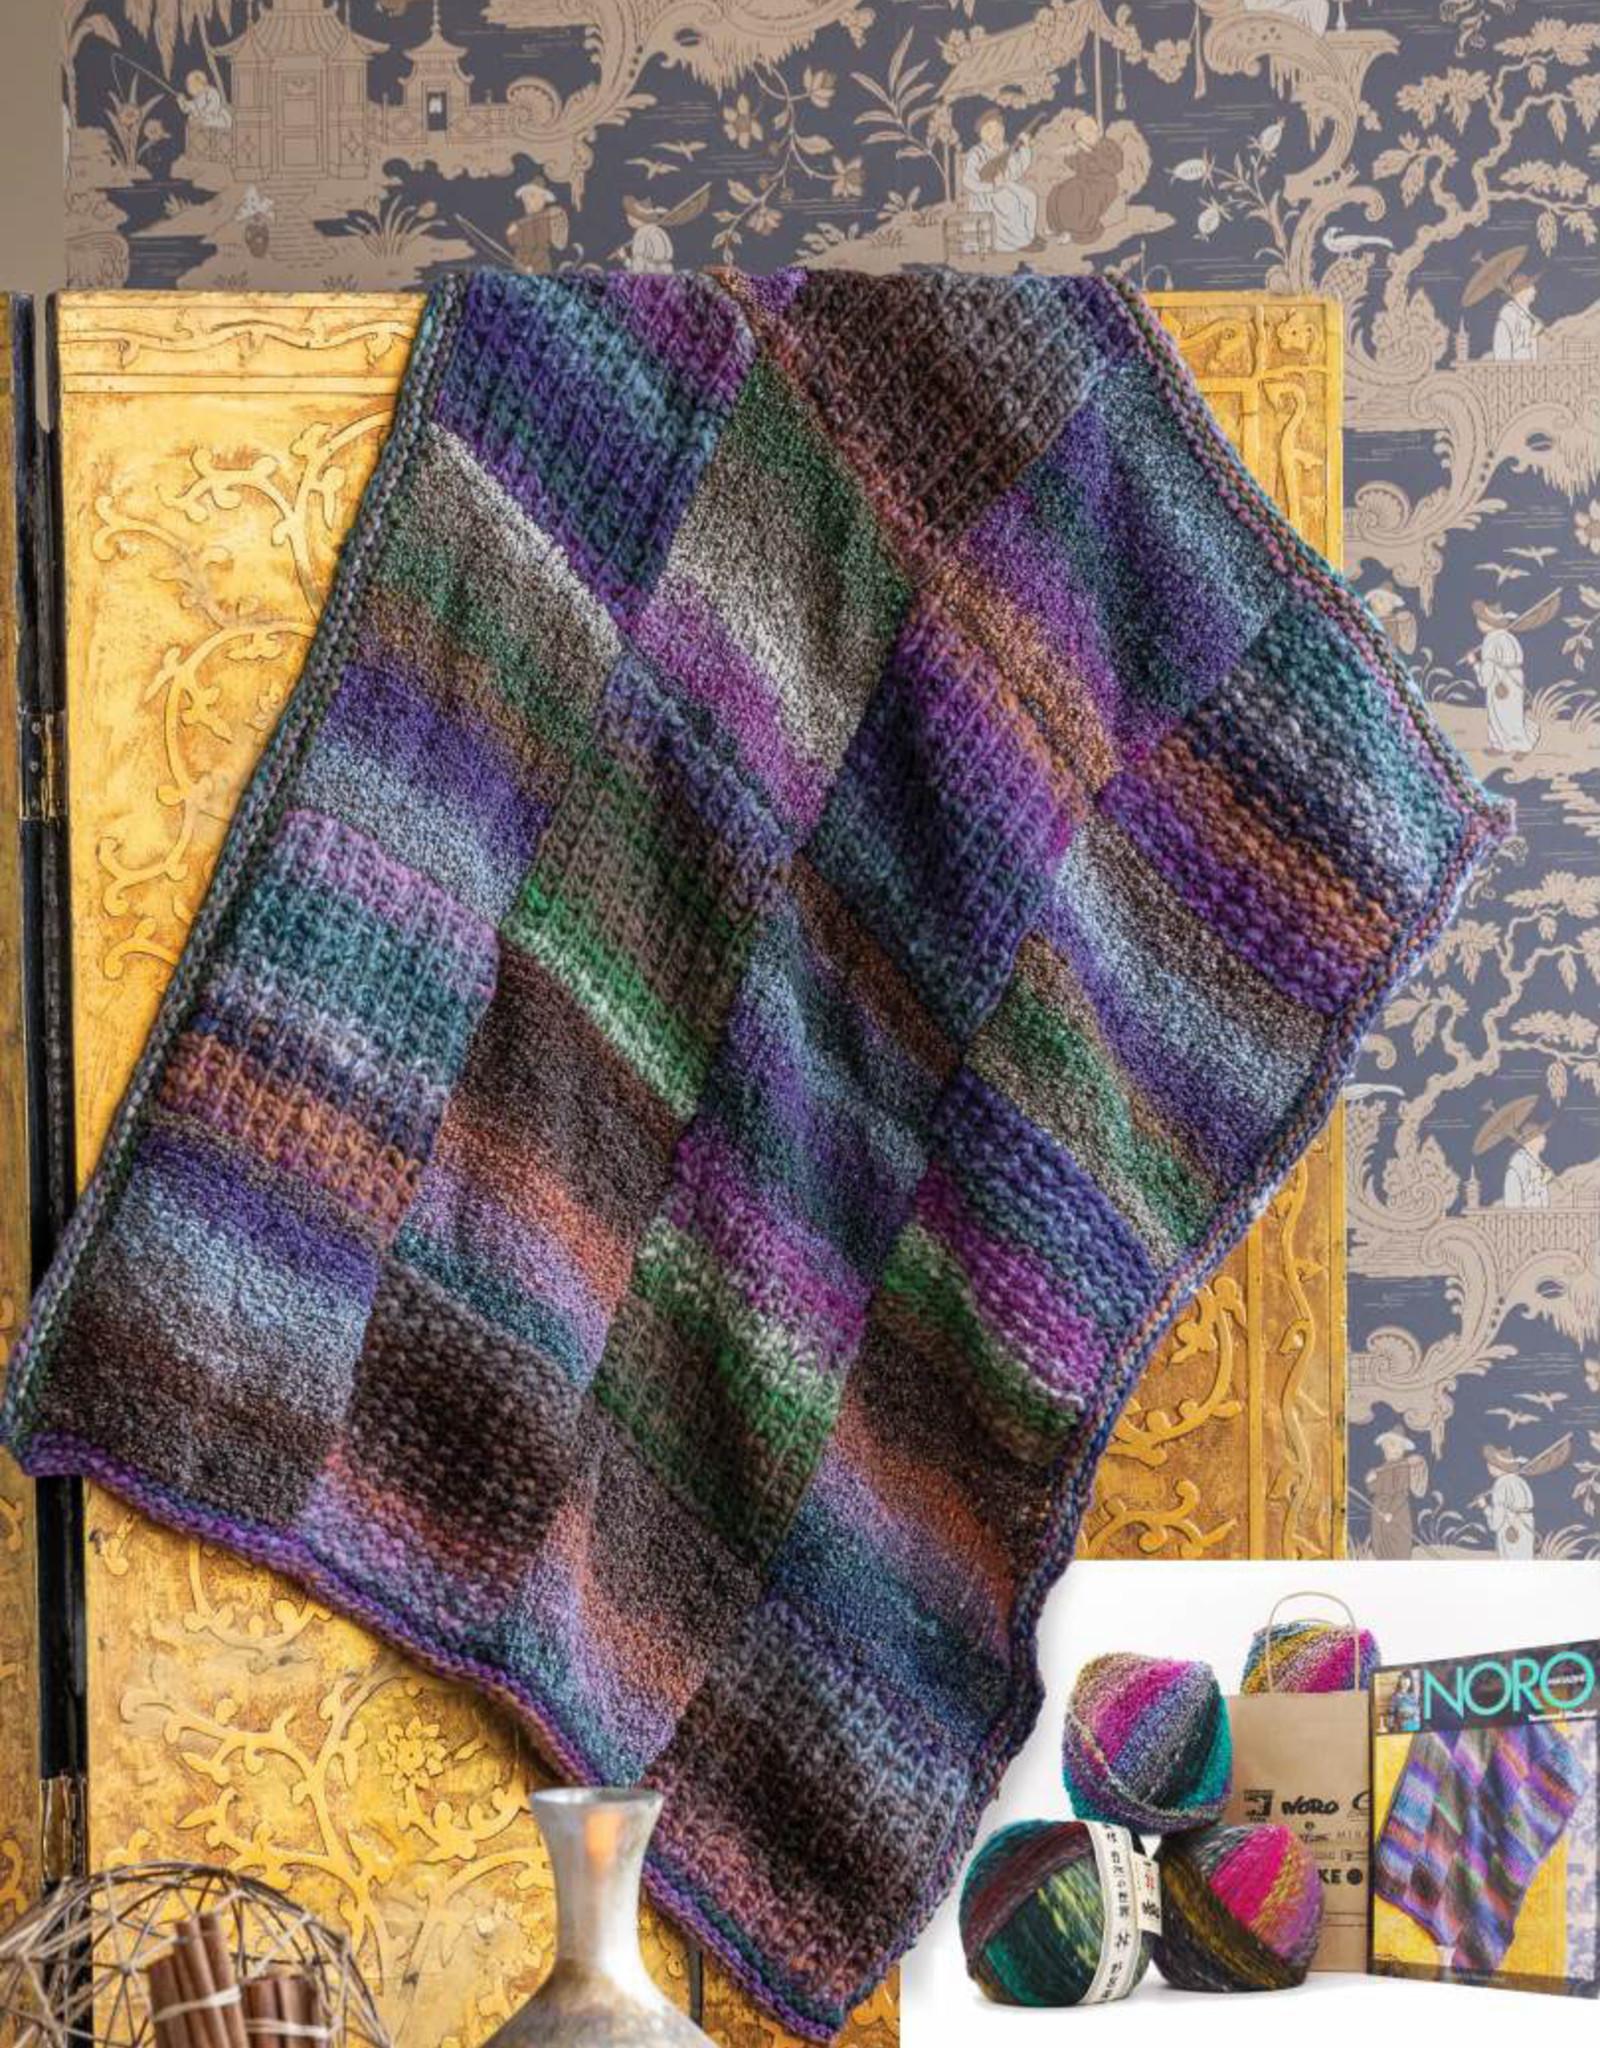 Textured Blanket in Bachi & Kanzashi